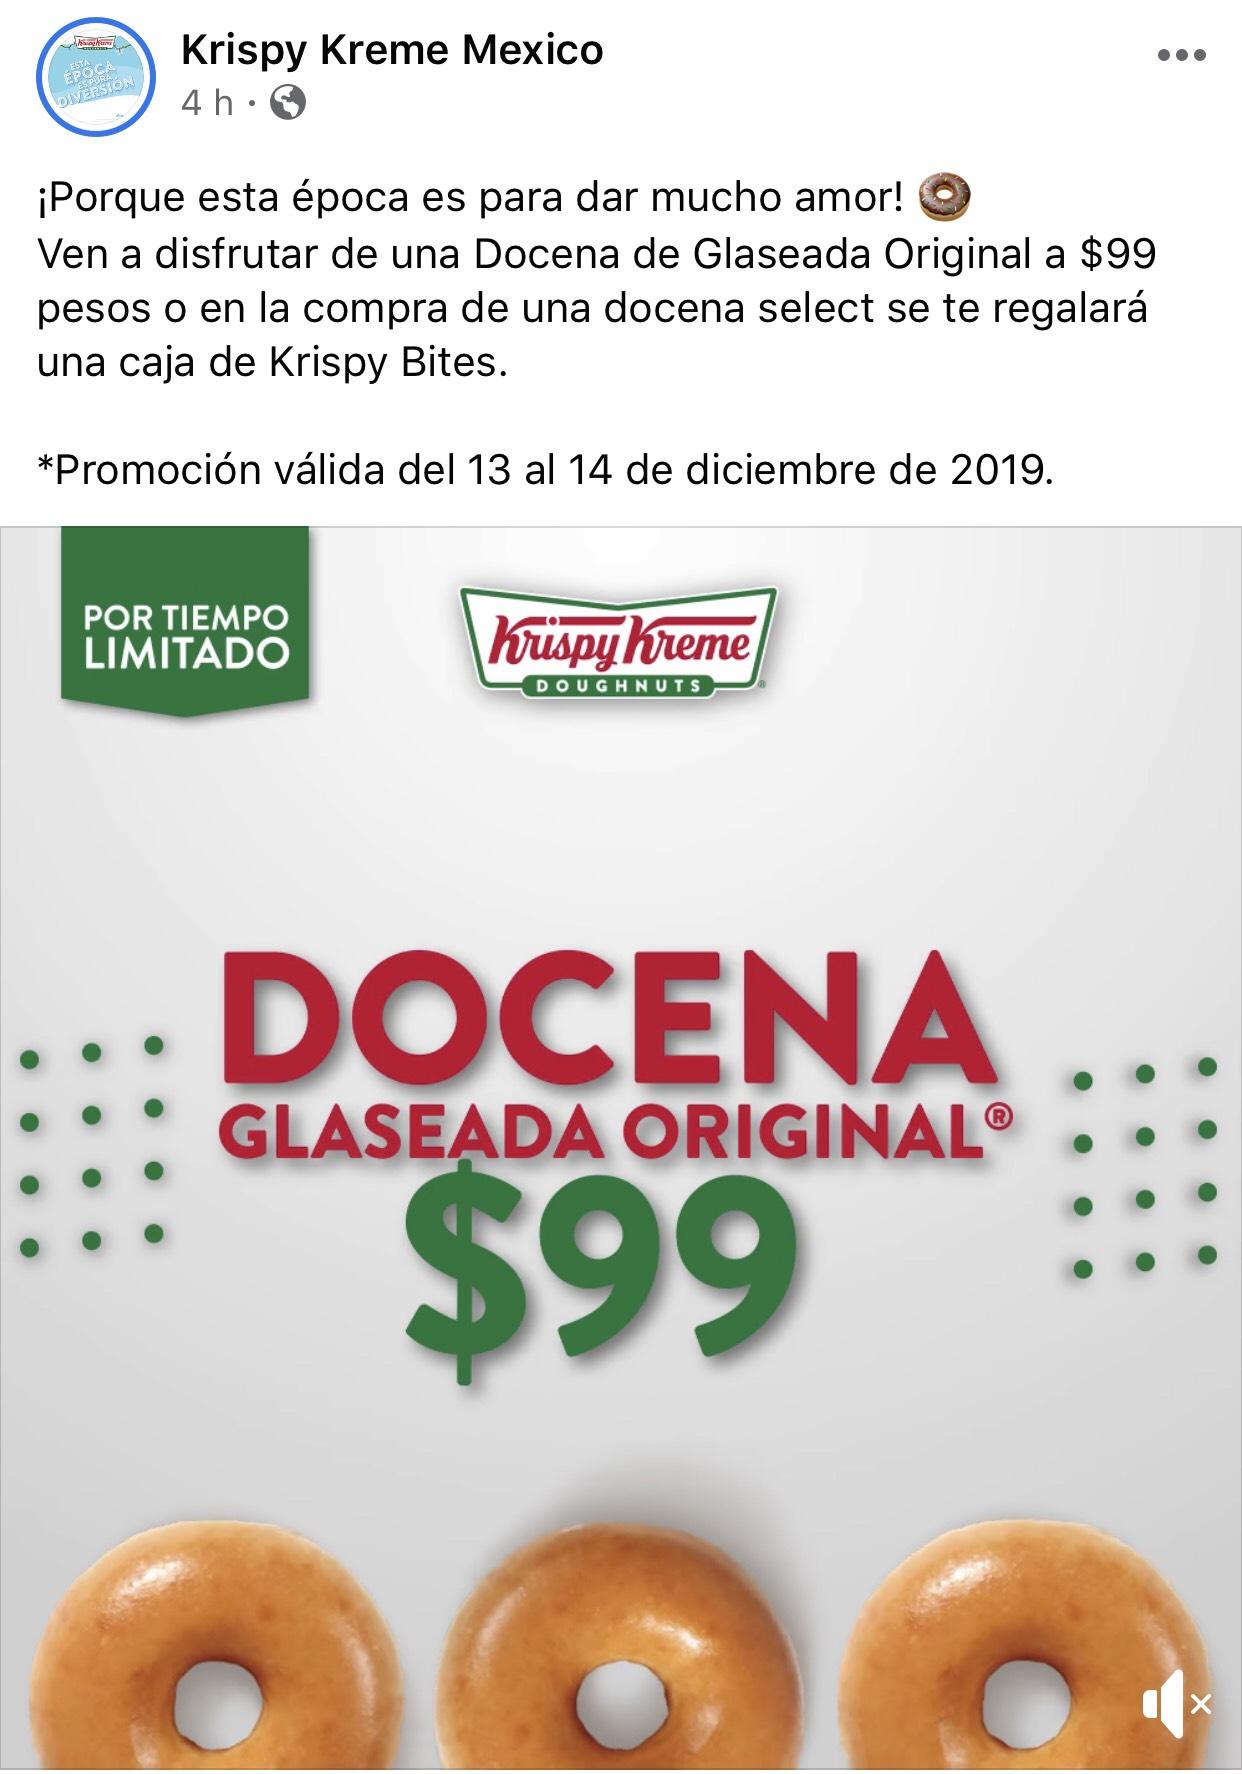 Krispy Kreme: Docena Glaseada Original $99 del 13 al 14 de Diciembre